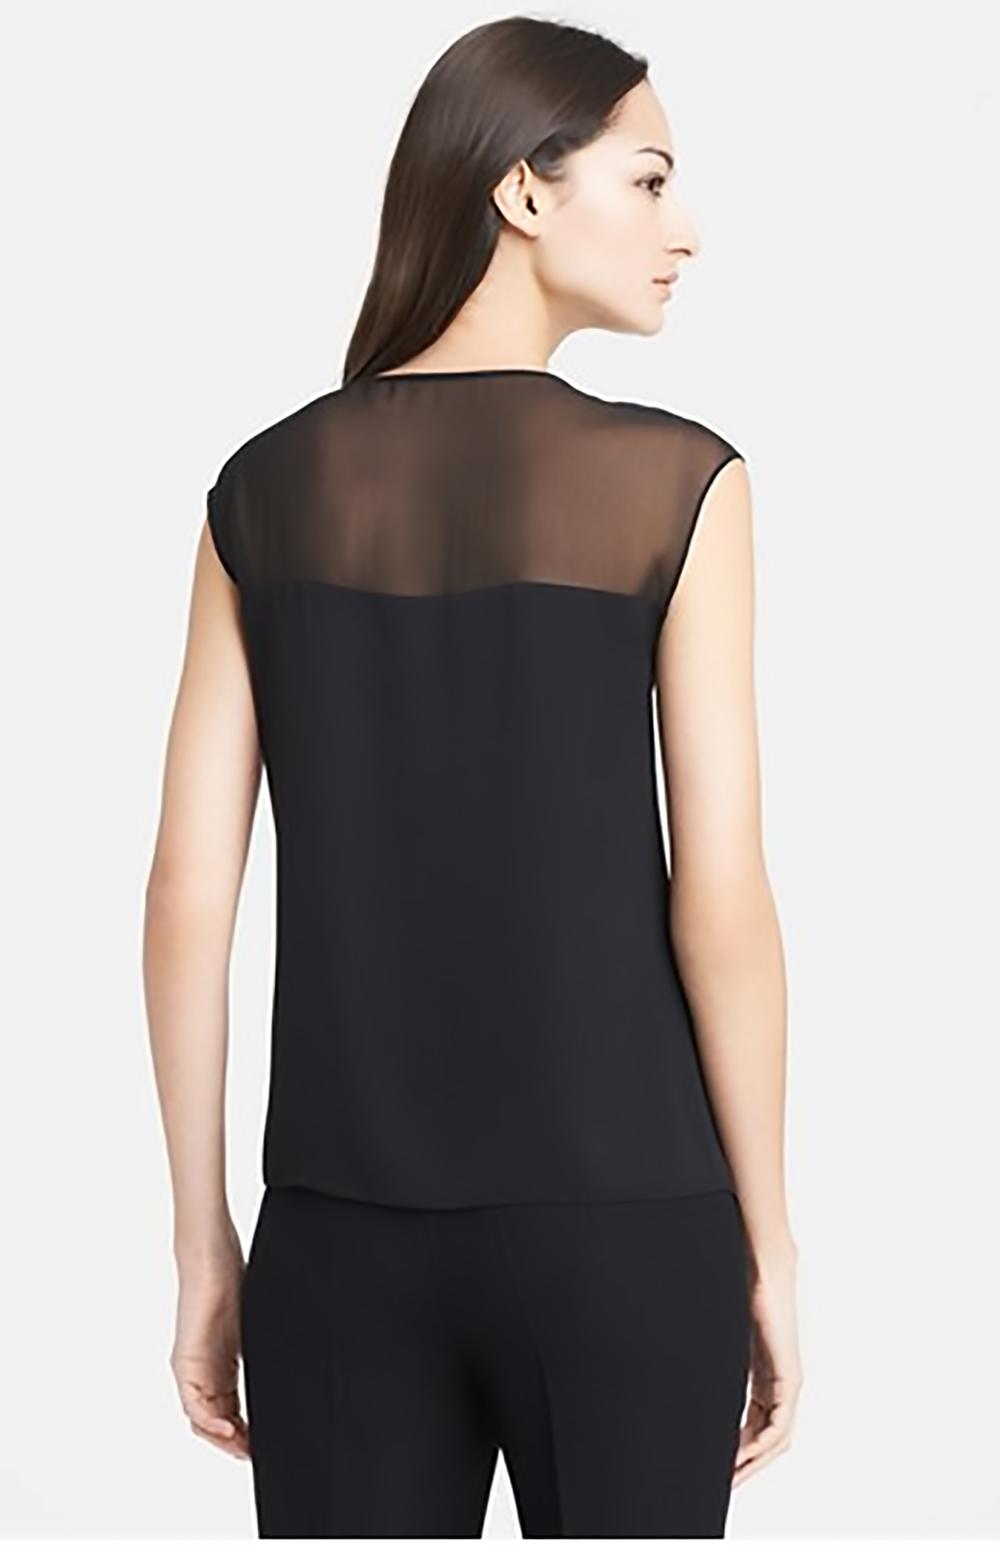 nordstrom stretch silk sheel armani collezioni see thru shoulders 1500.jpg